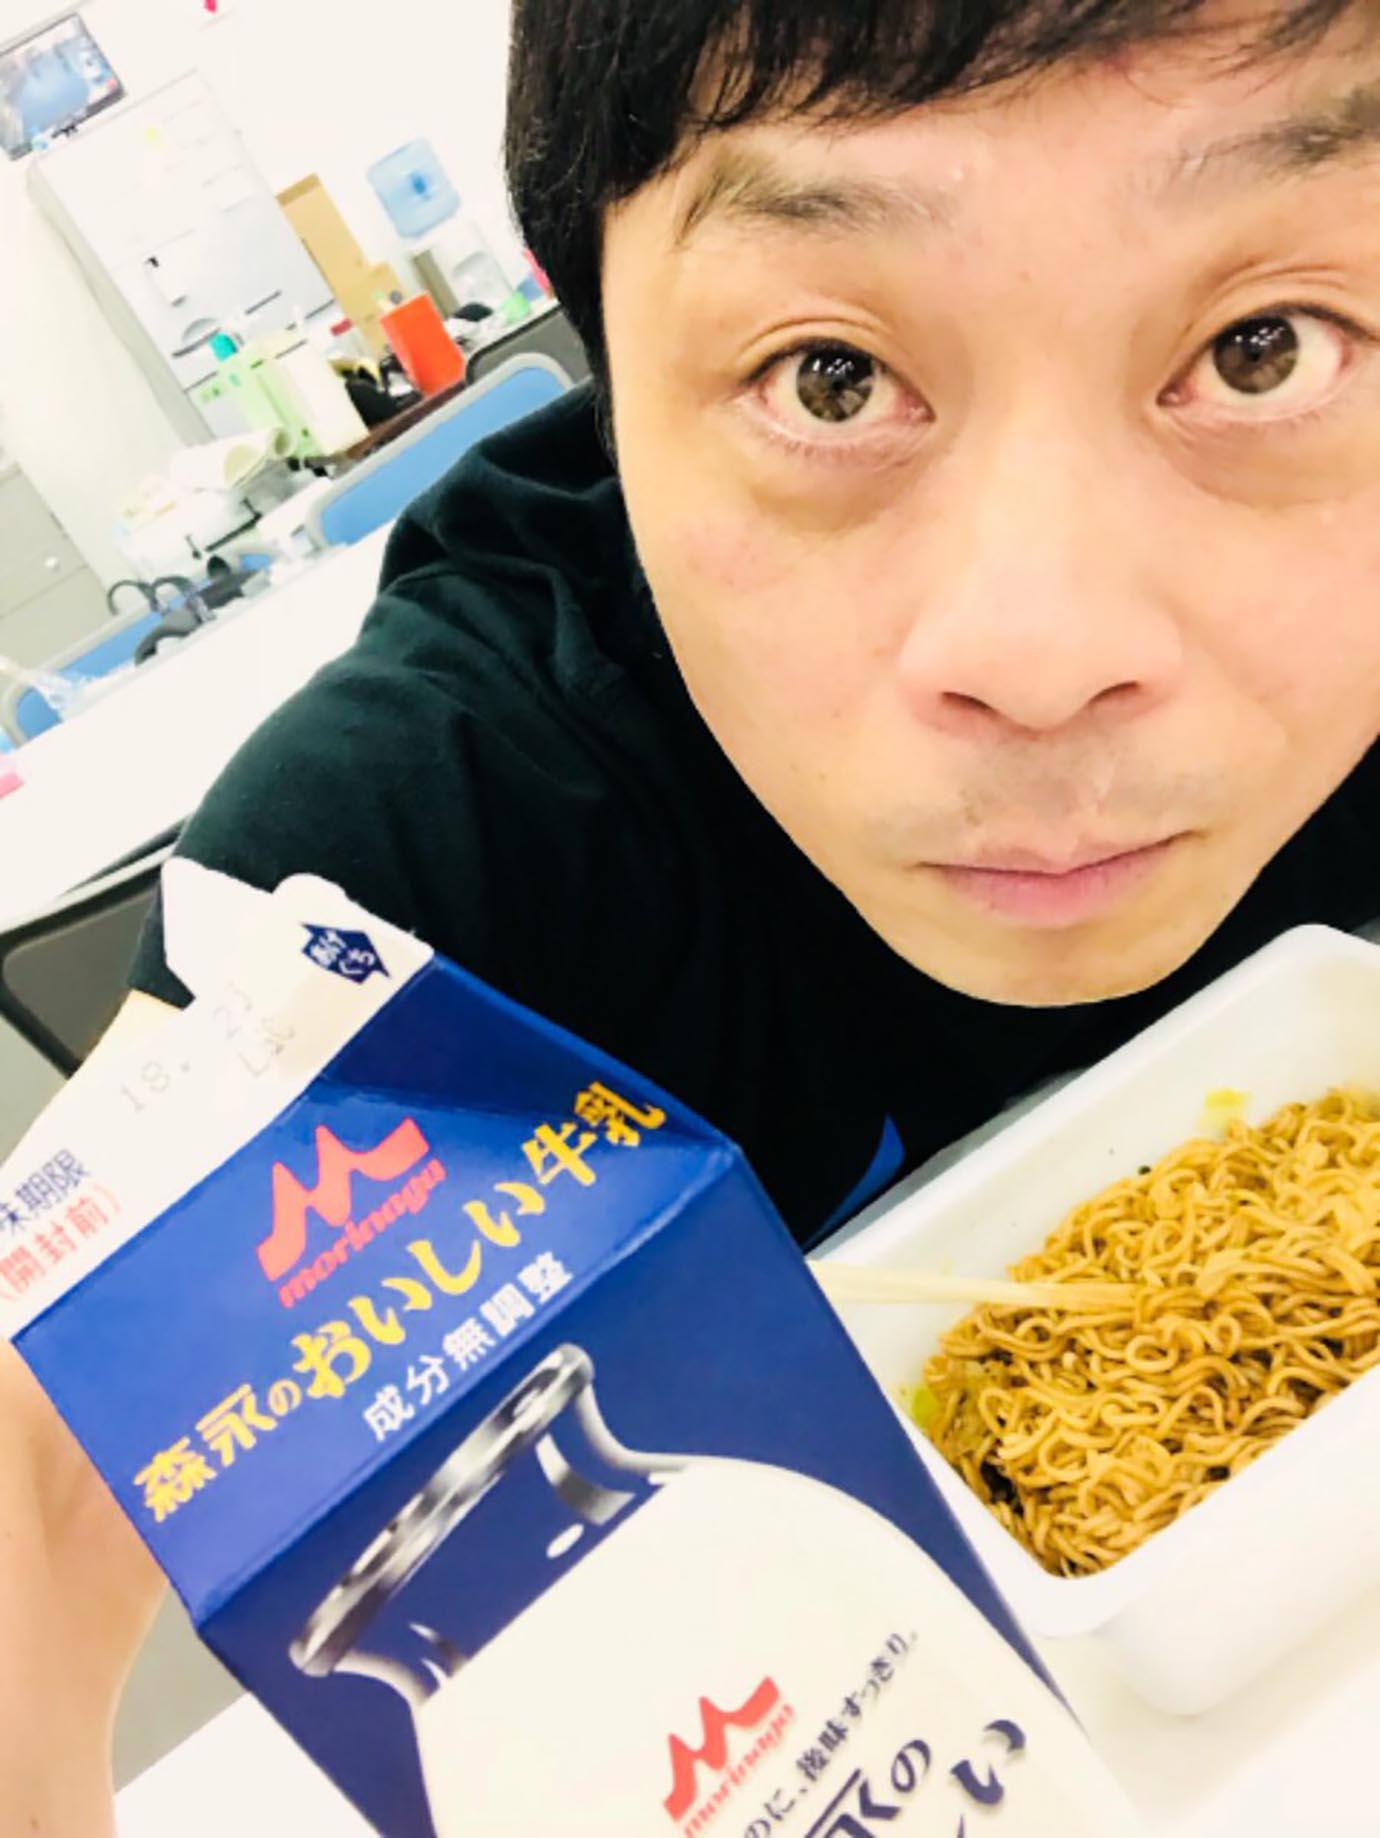 pierre-taki-miyake-hiroki-news